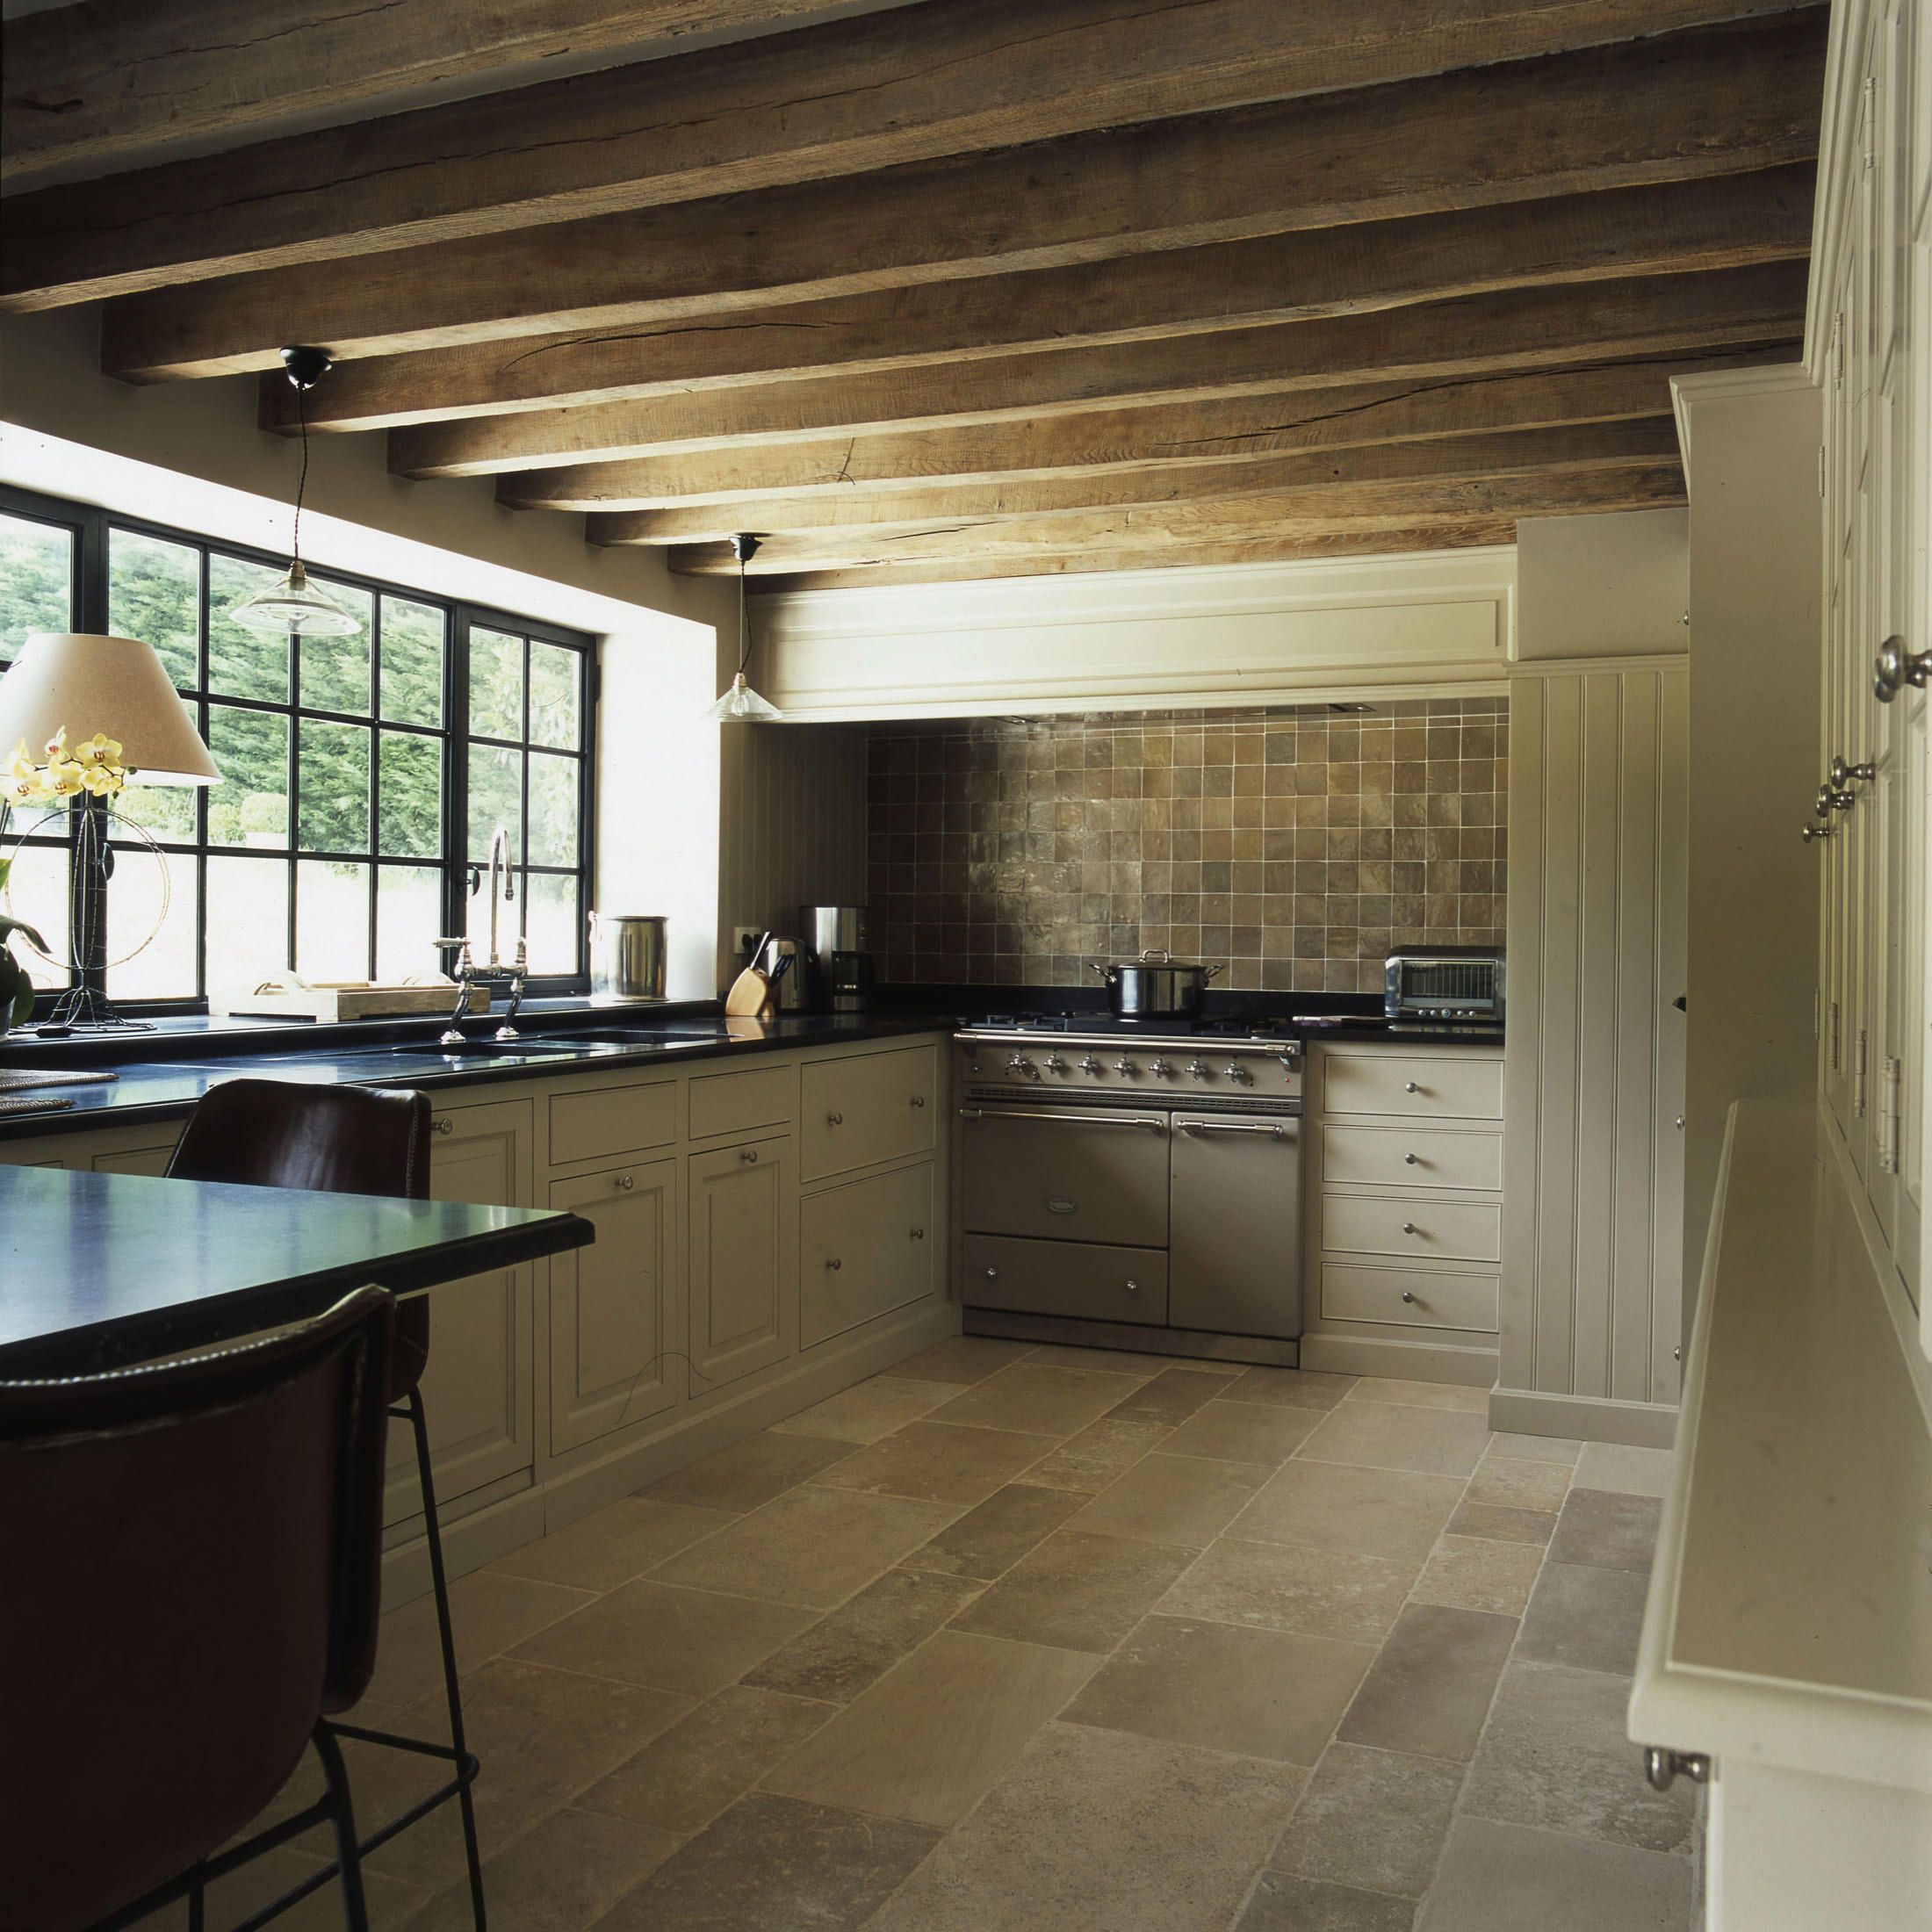 Kitchen «Amboise», by Baden Baden (Brussels) www.badenconcept.com ...